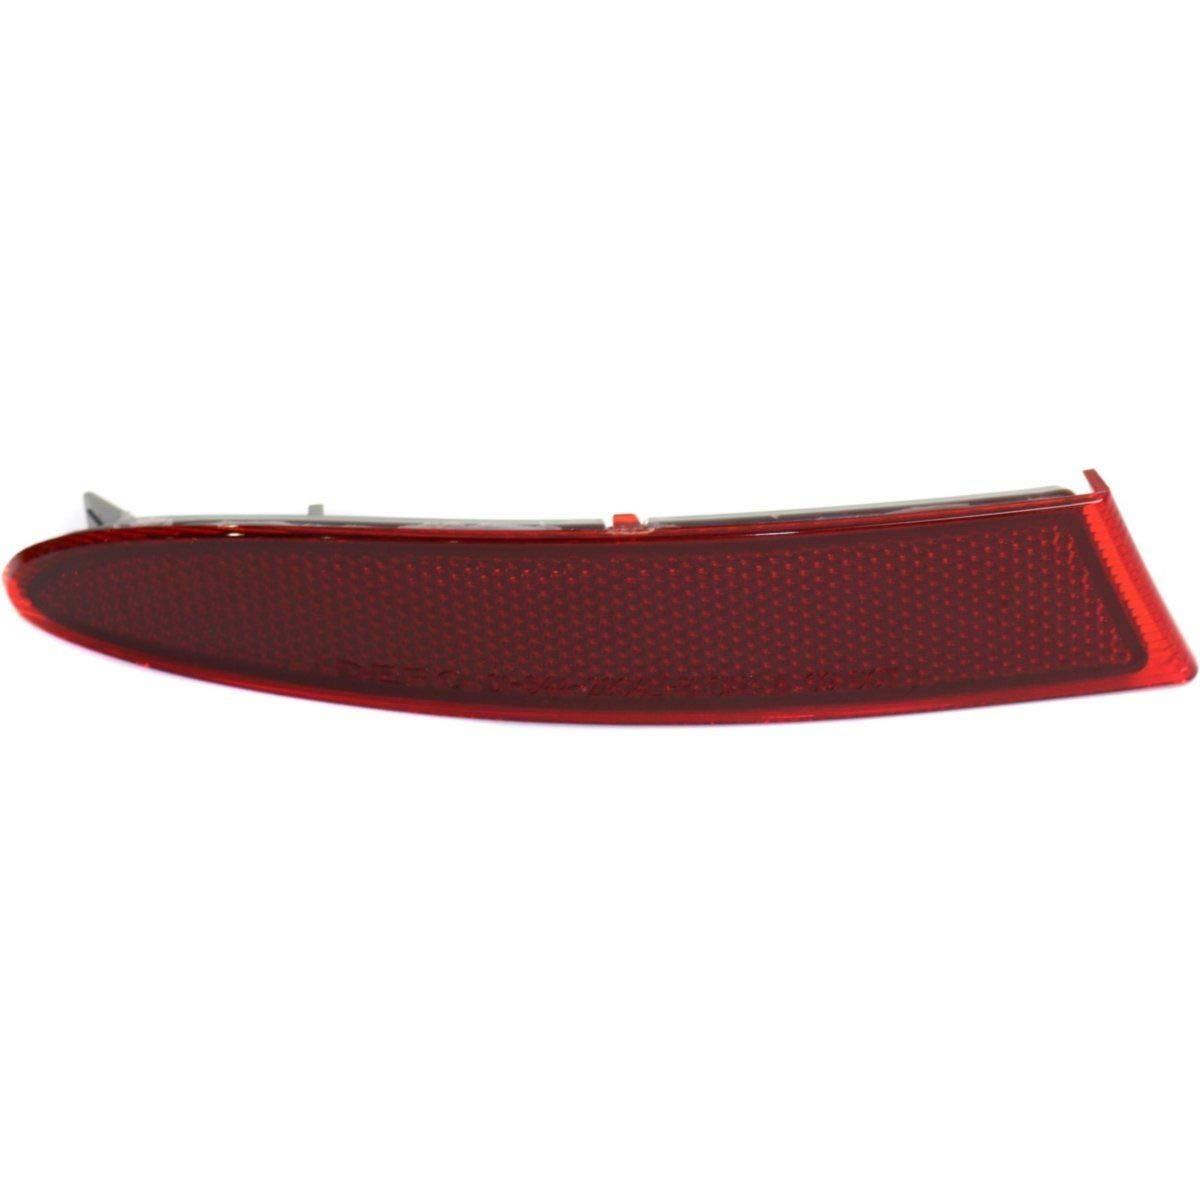 New Rear Diver Side Bumper Reflector For 2011-2017 Bmw X3 BM1184104 63147217315